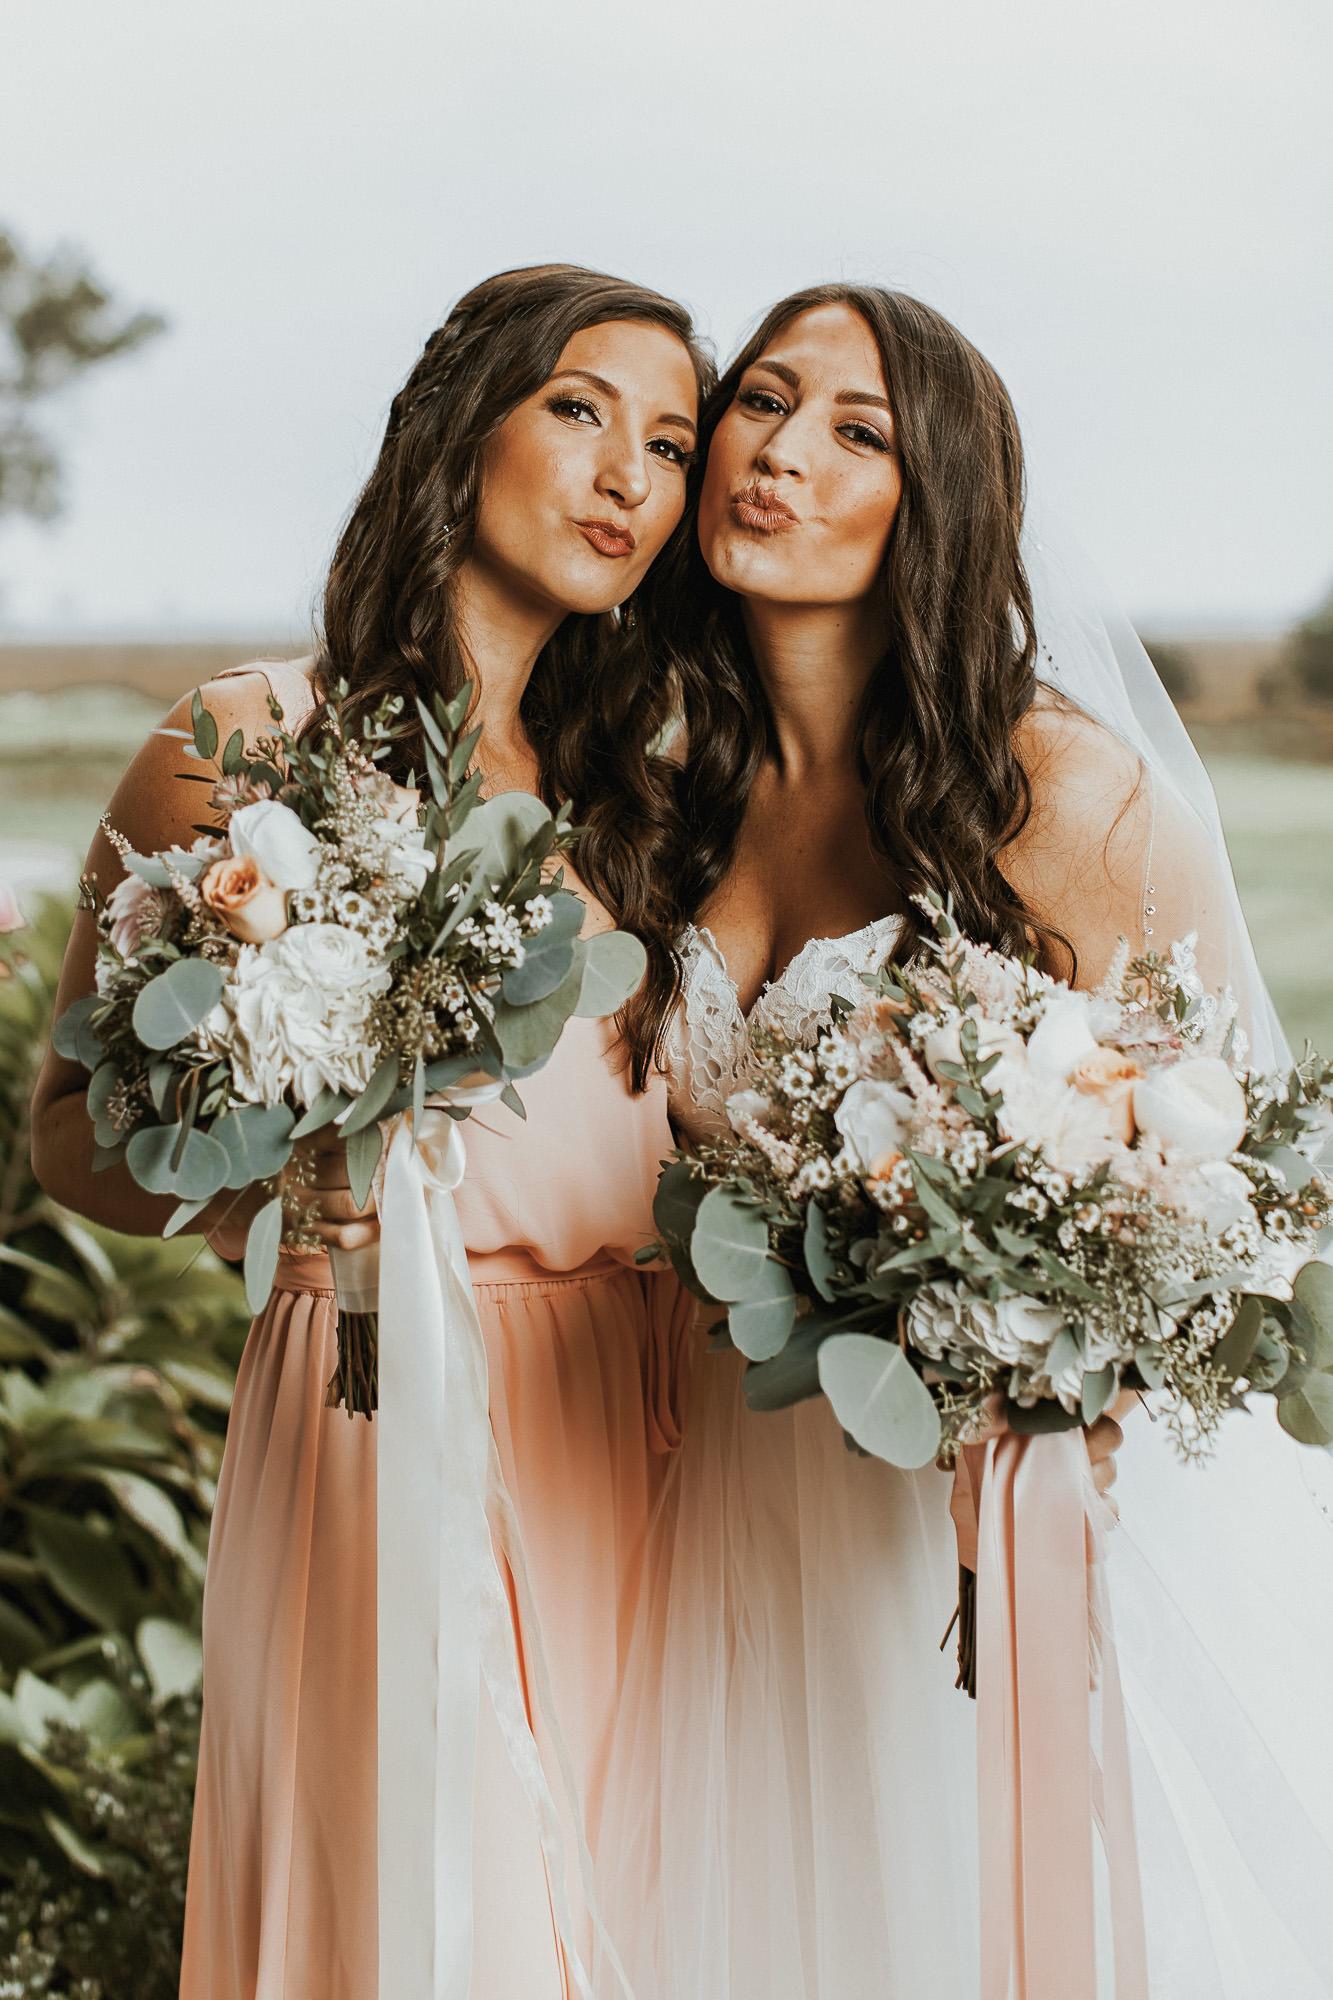 Our Wedding Photos | Pine Barren Beauty | wedding photo inspiration, bridal party colors, blush bridesmaids dresses, bridal party photos